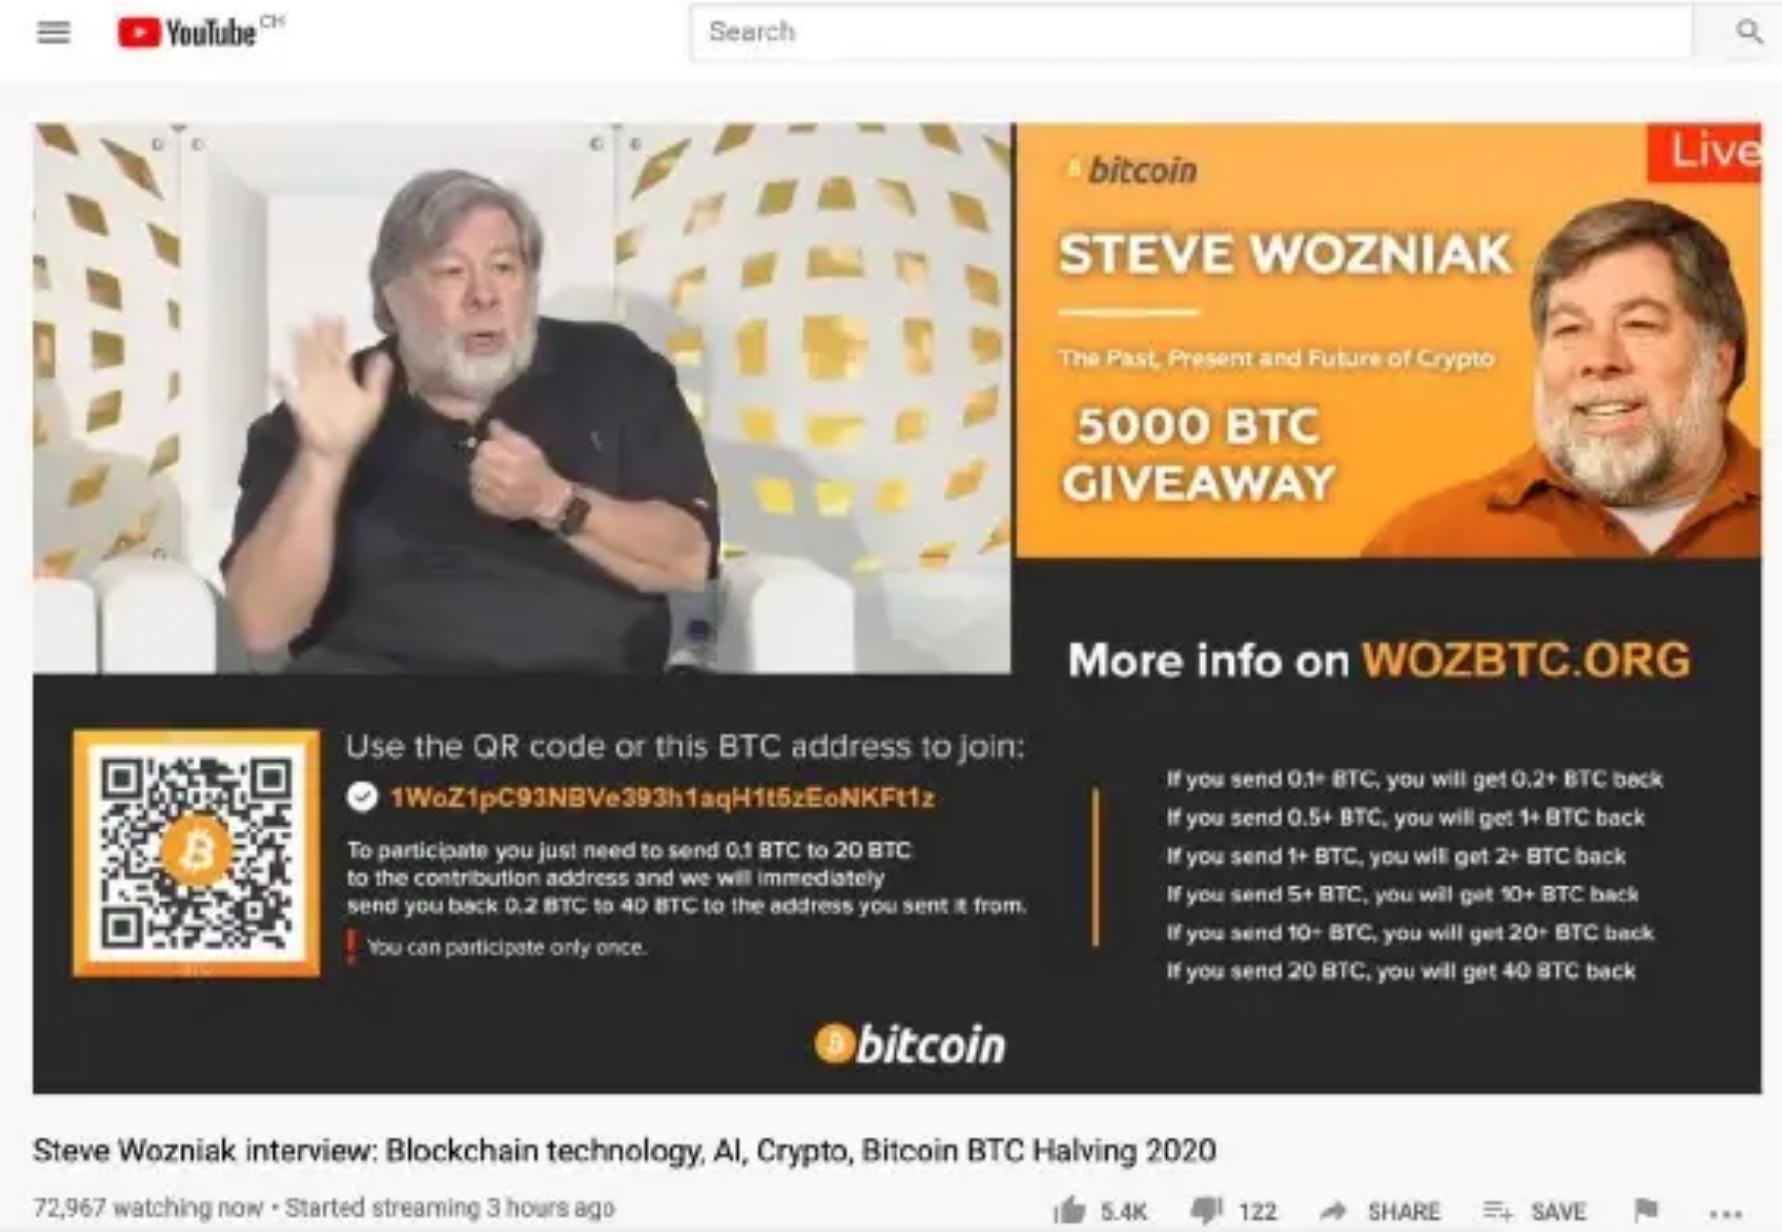 bitcoin youtube video